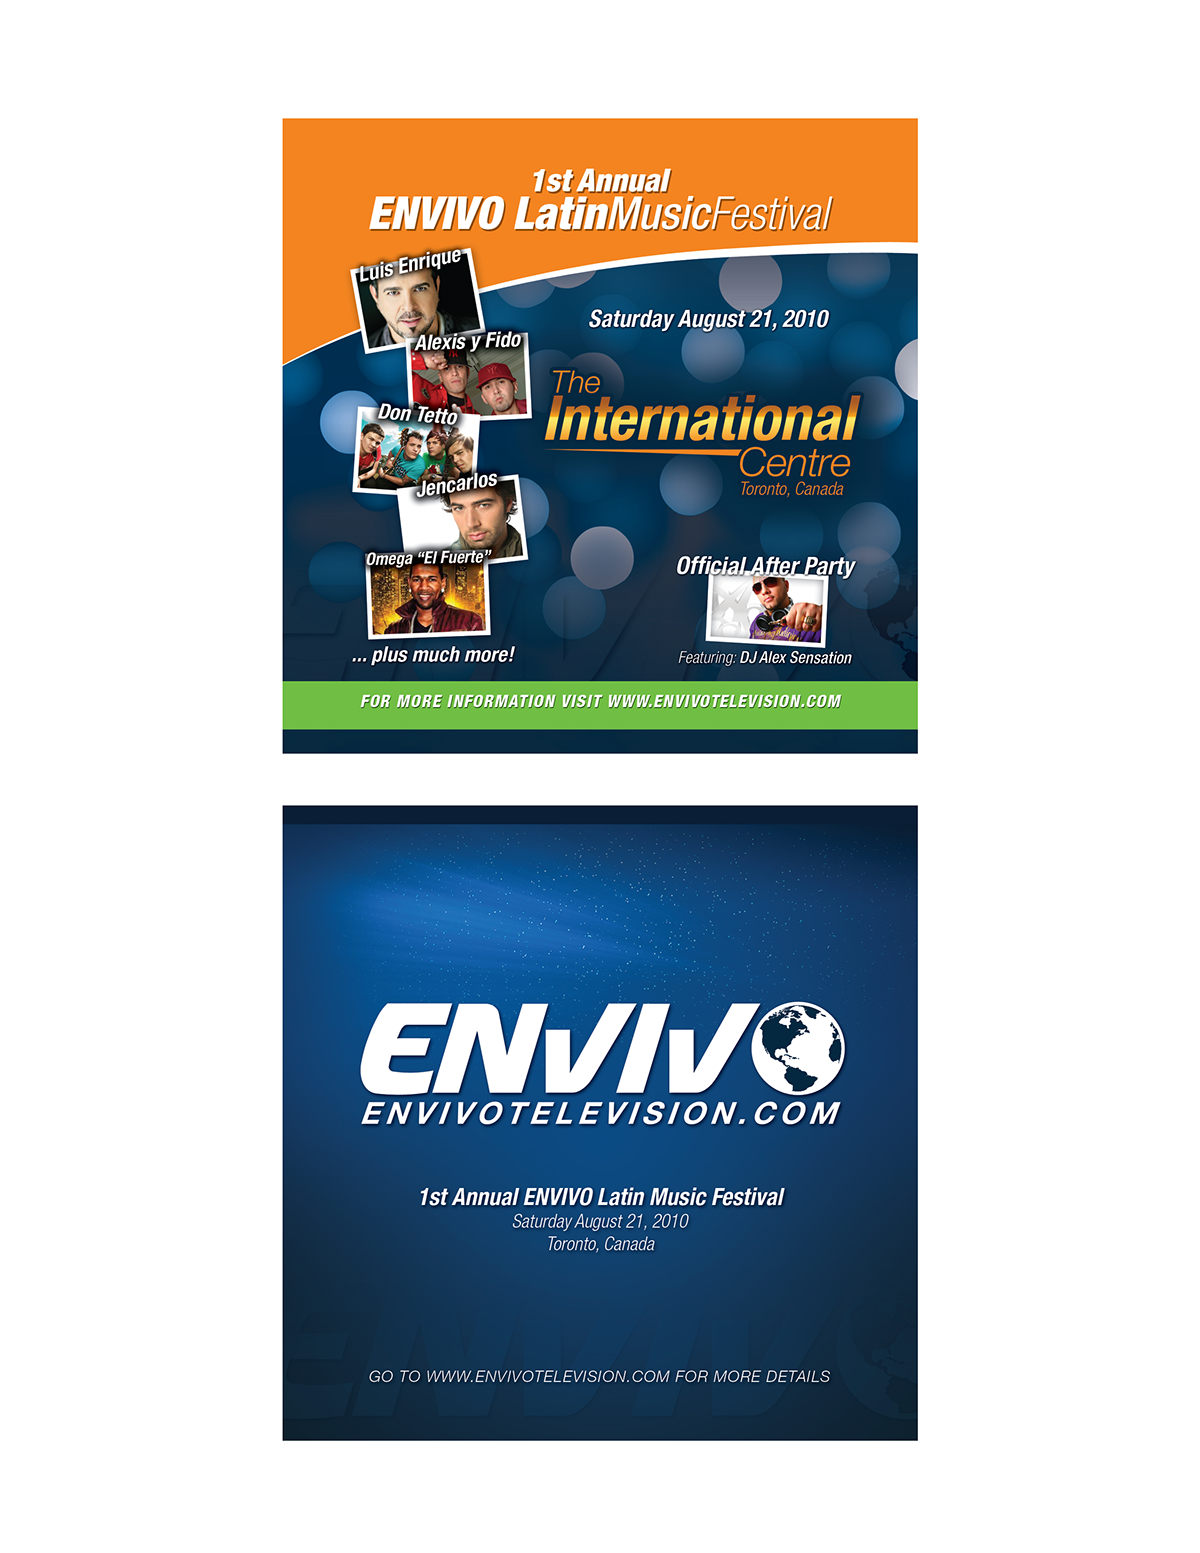 envivo,Web marketing,posters,Fliers